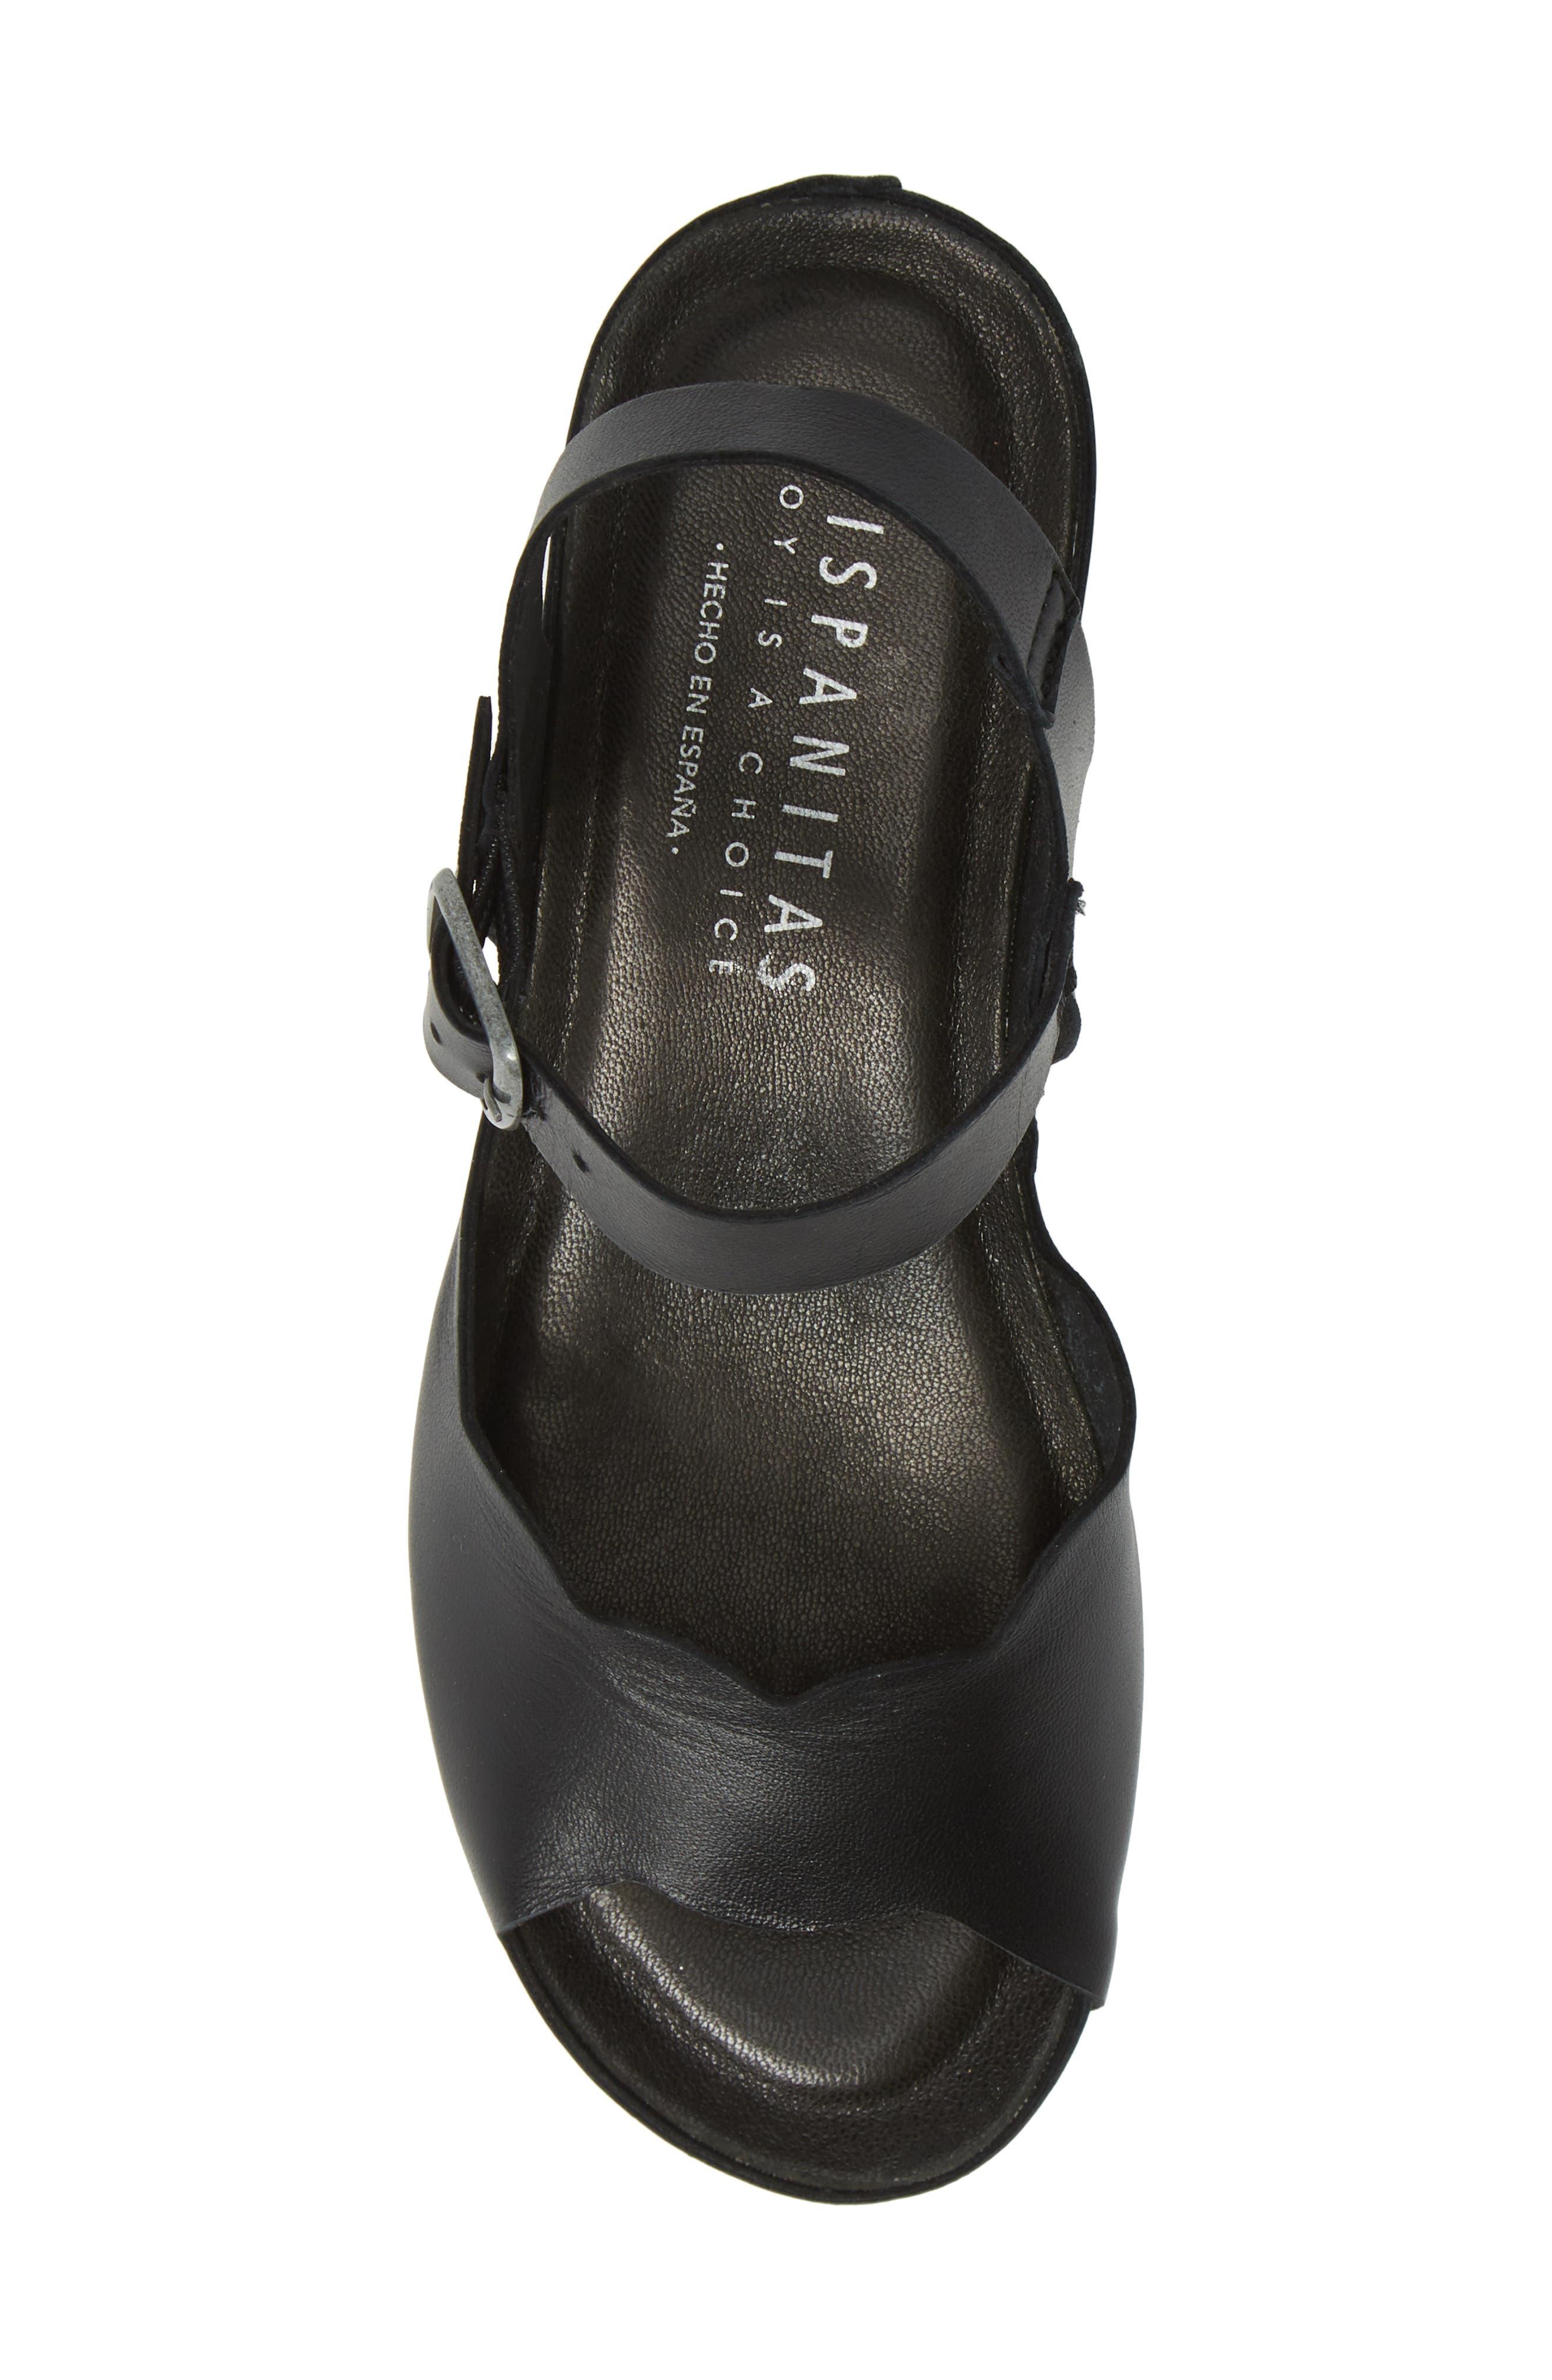 HISPANITAS, Vanetta Wedge Sandal, Alternate thumbnail 5, color, NAPA LAM BLACK LEATHER